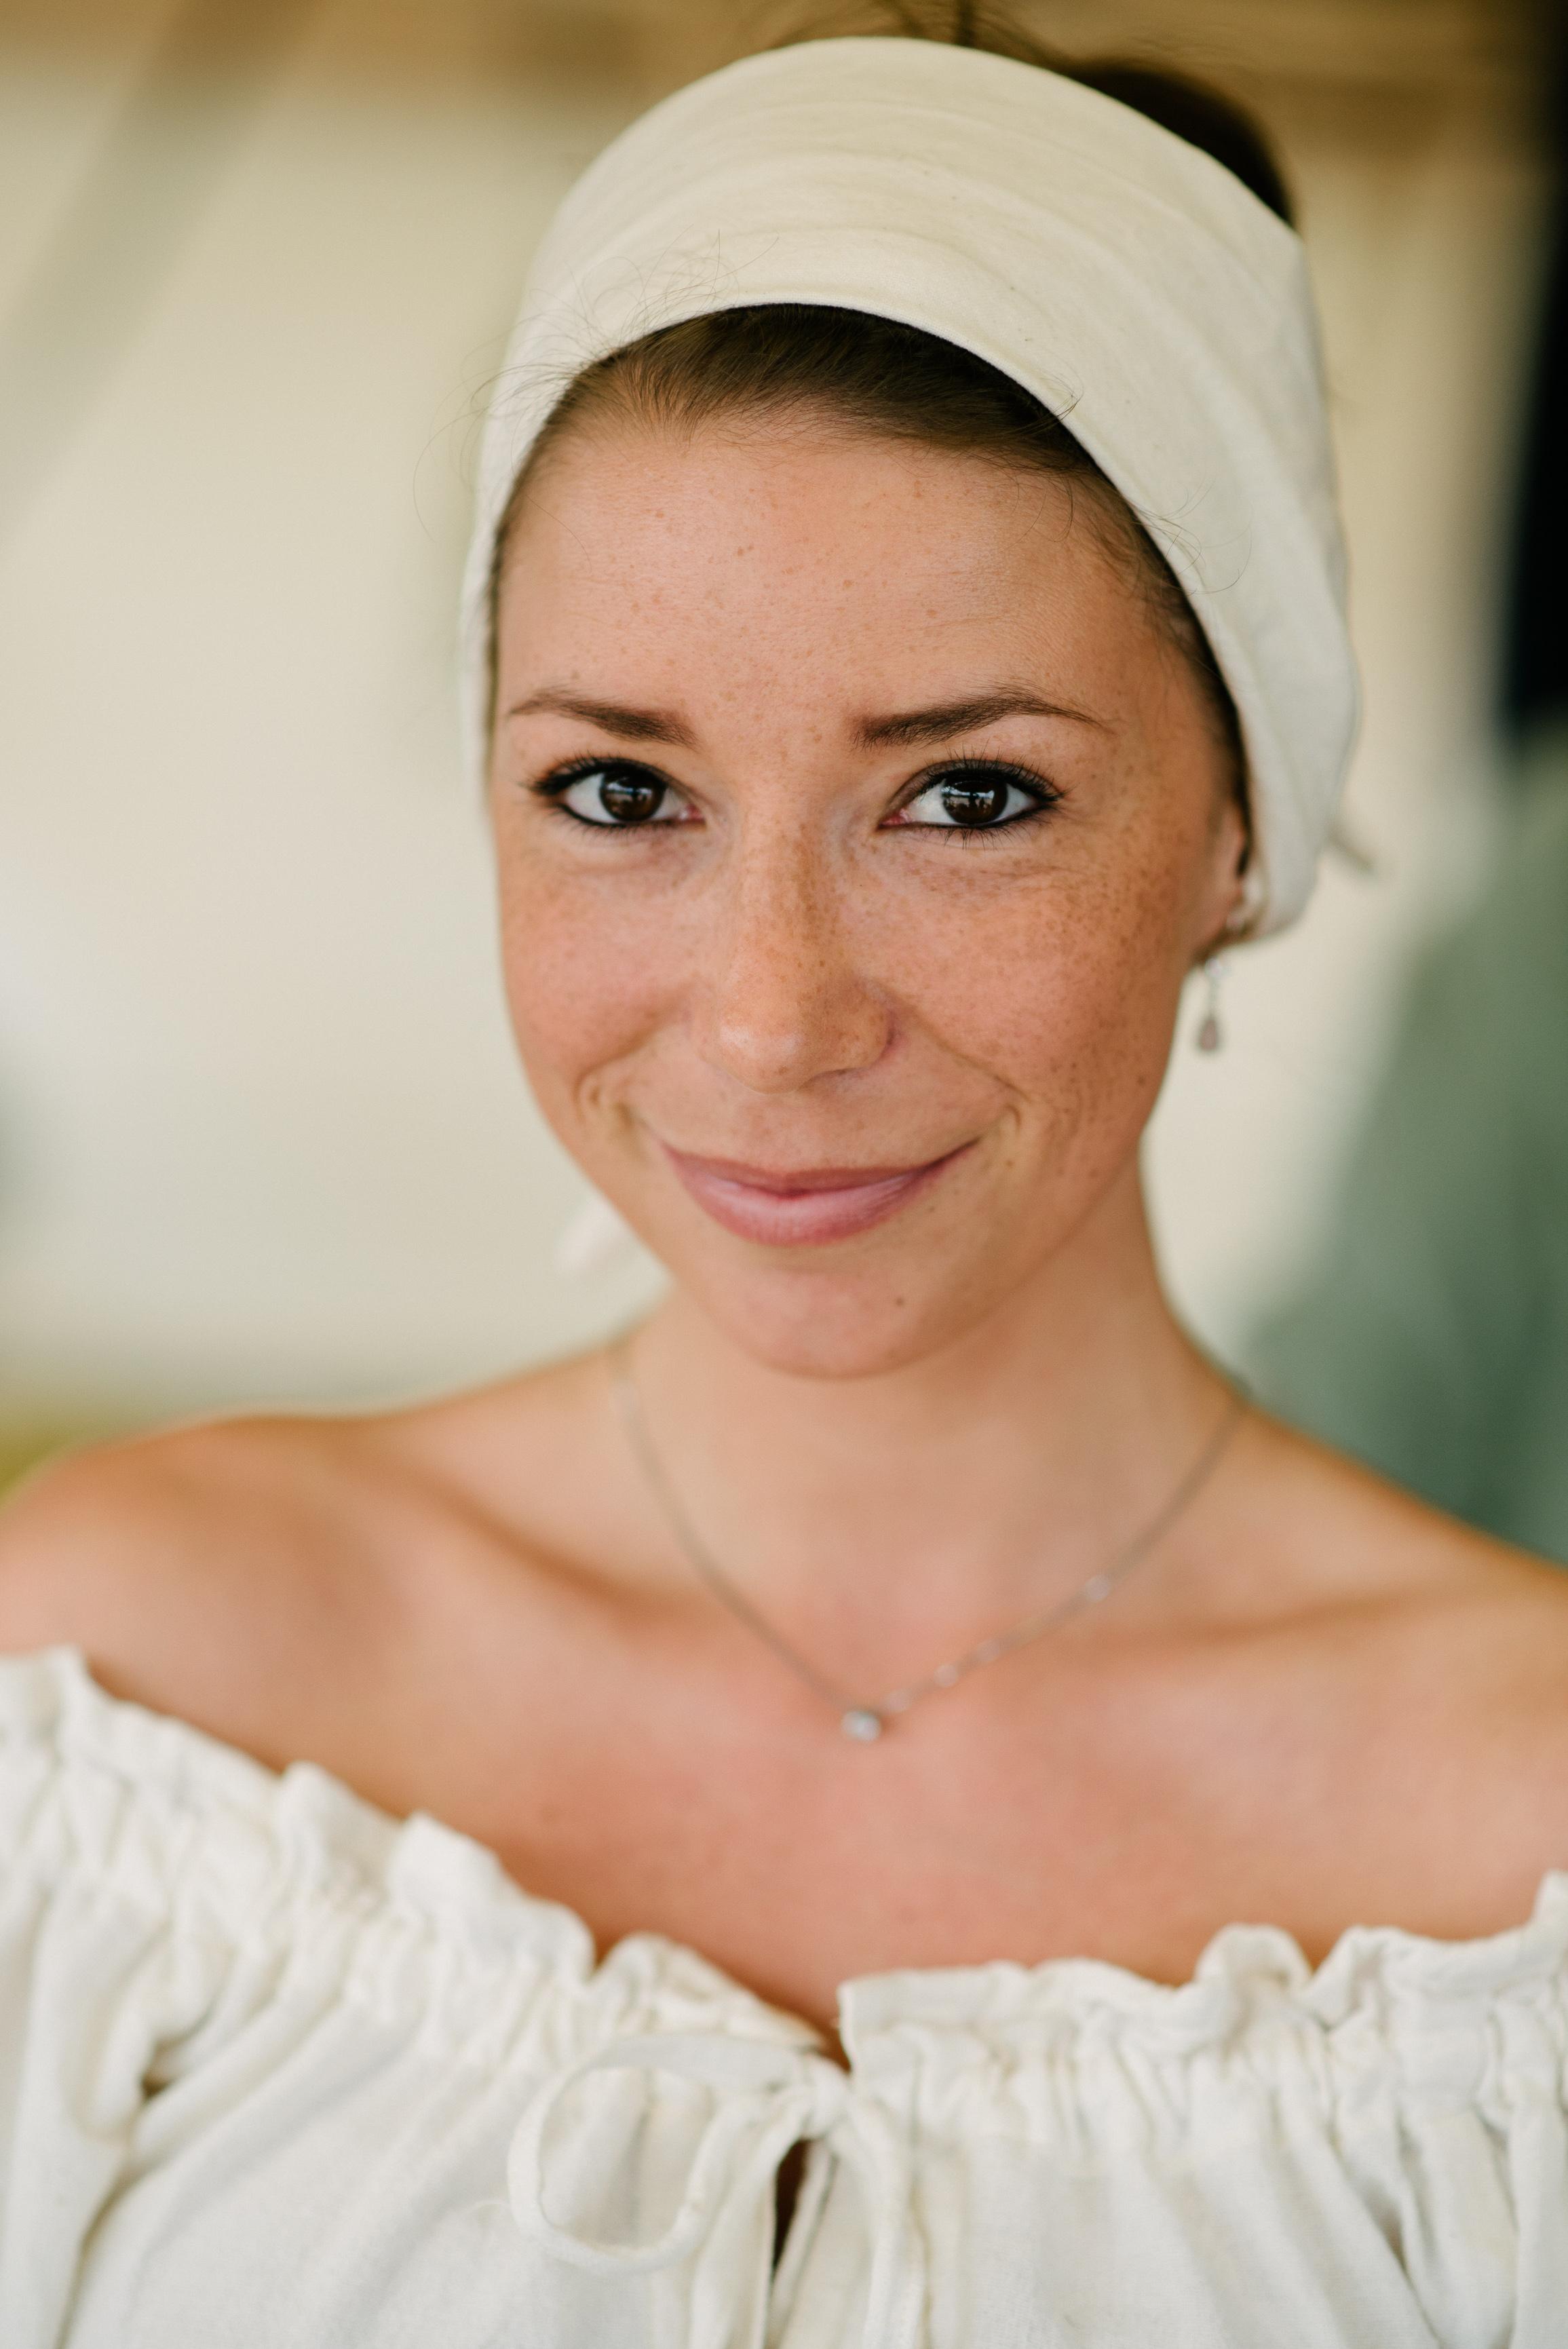 ML_16_Faces of Mera Luna_Robin_Schmiedebach_115928.jpg